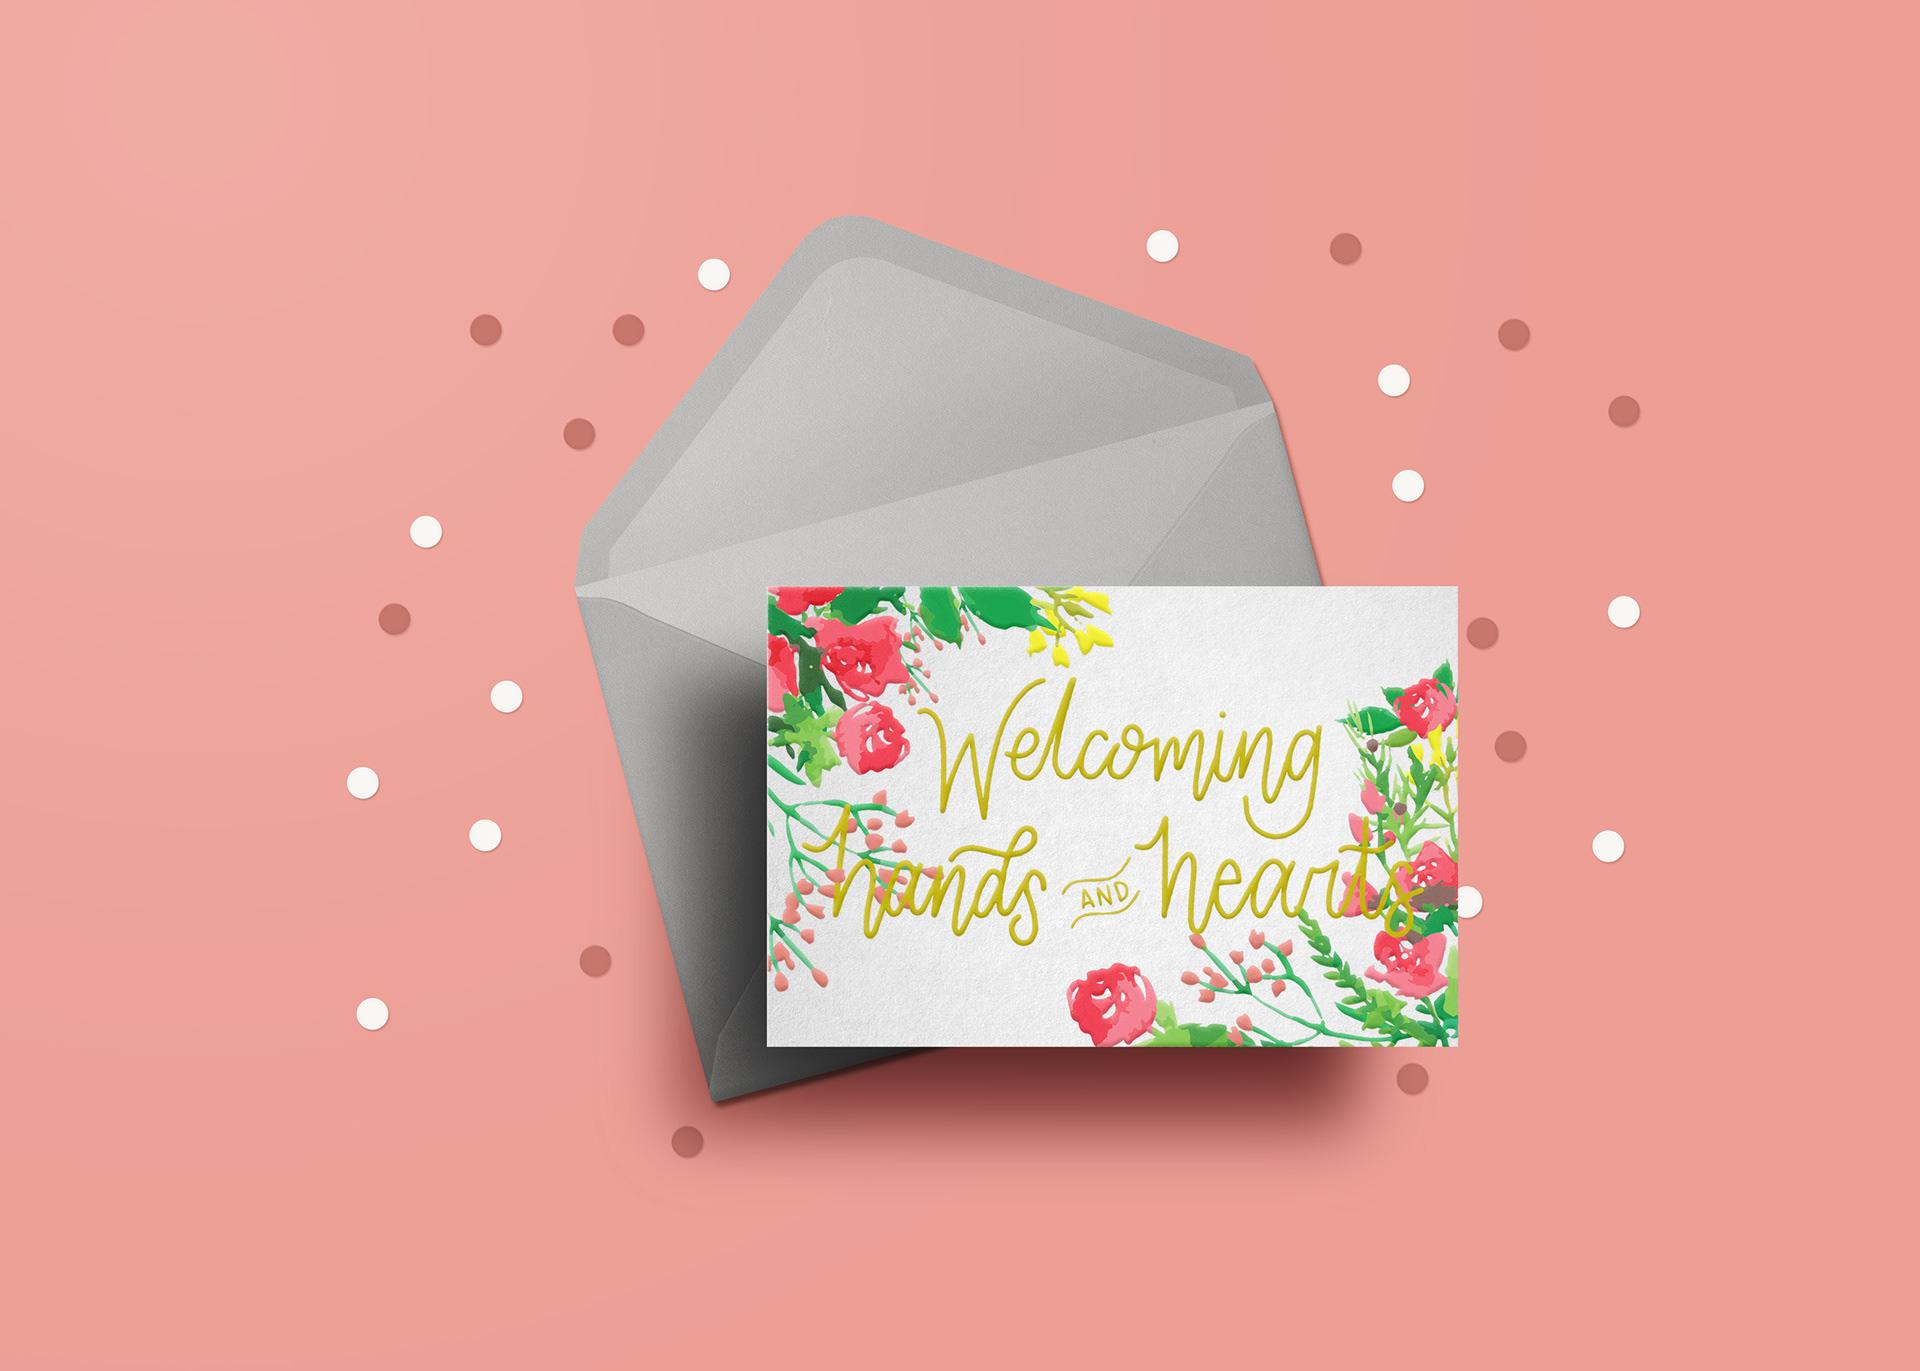 Kristen longbrake custom greeting cards custom greeting cards m4hsunfo